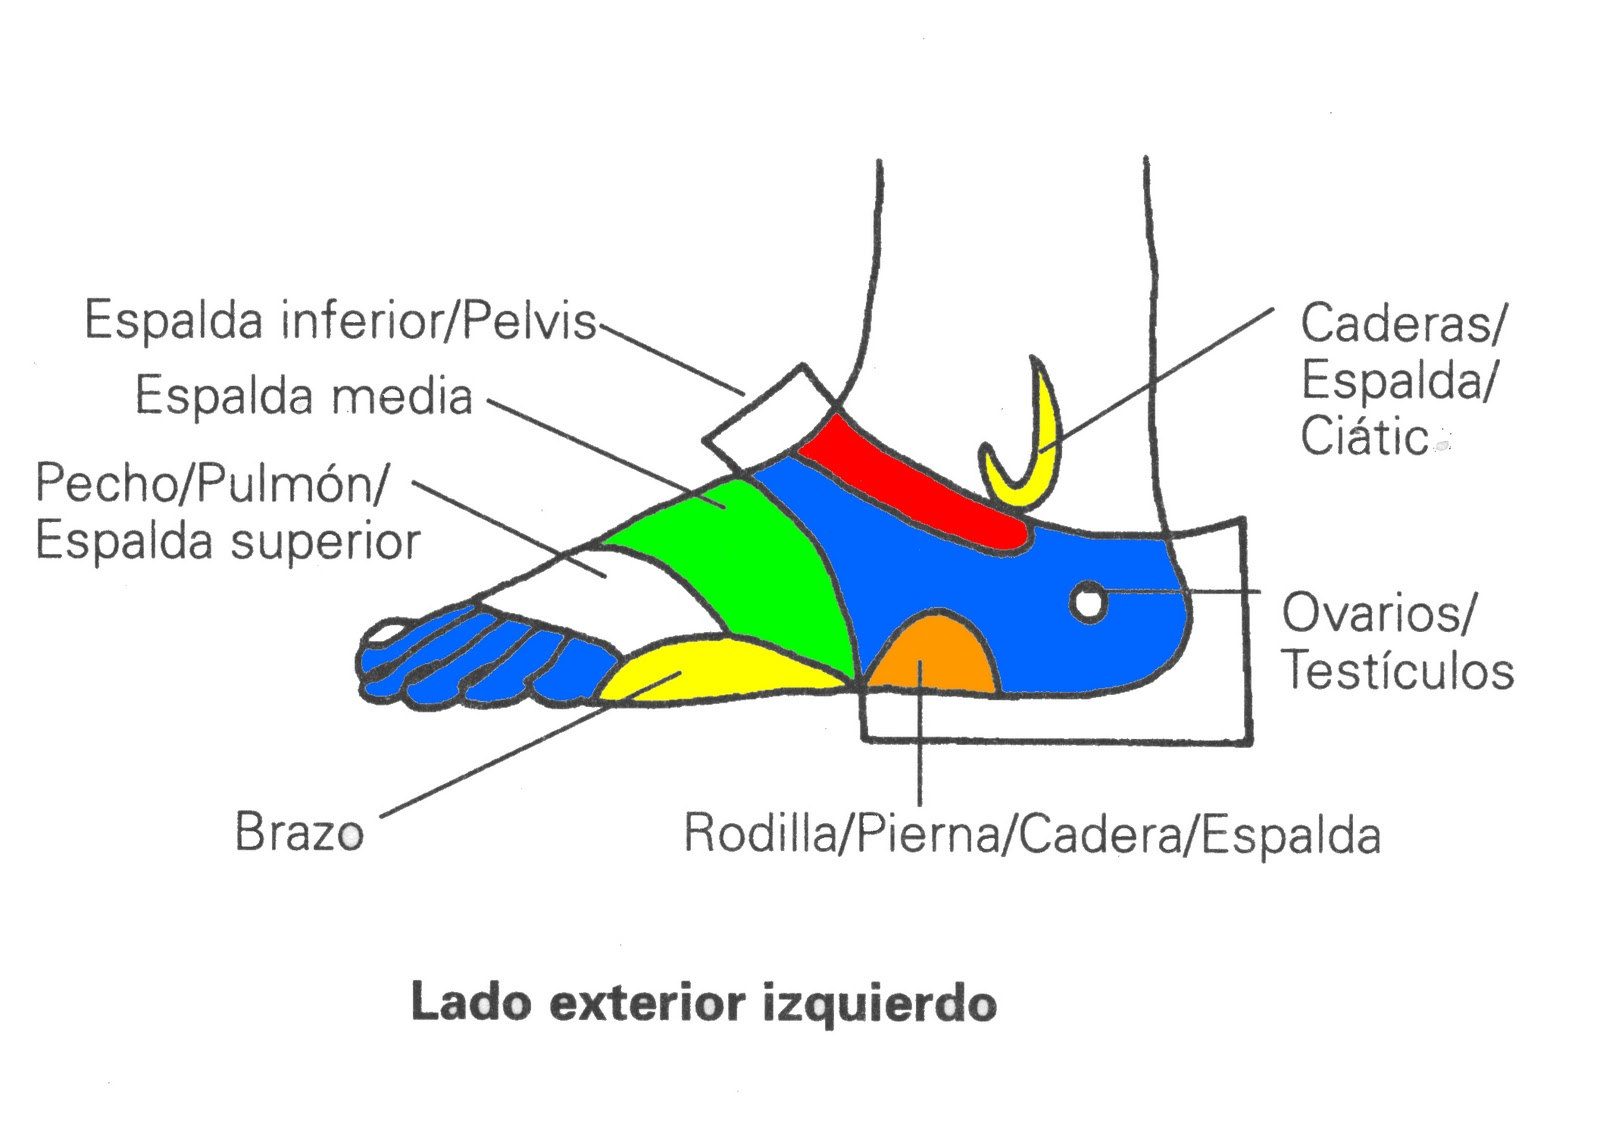 Reflexologia: Lado exterior izquierdo